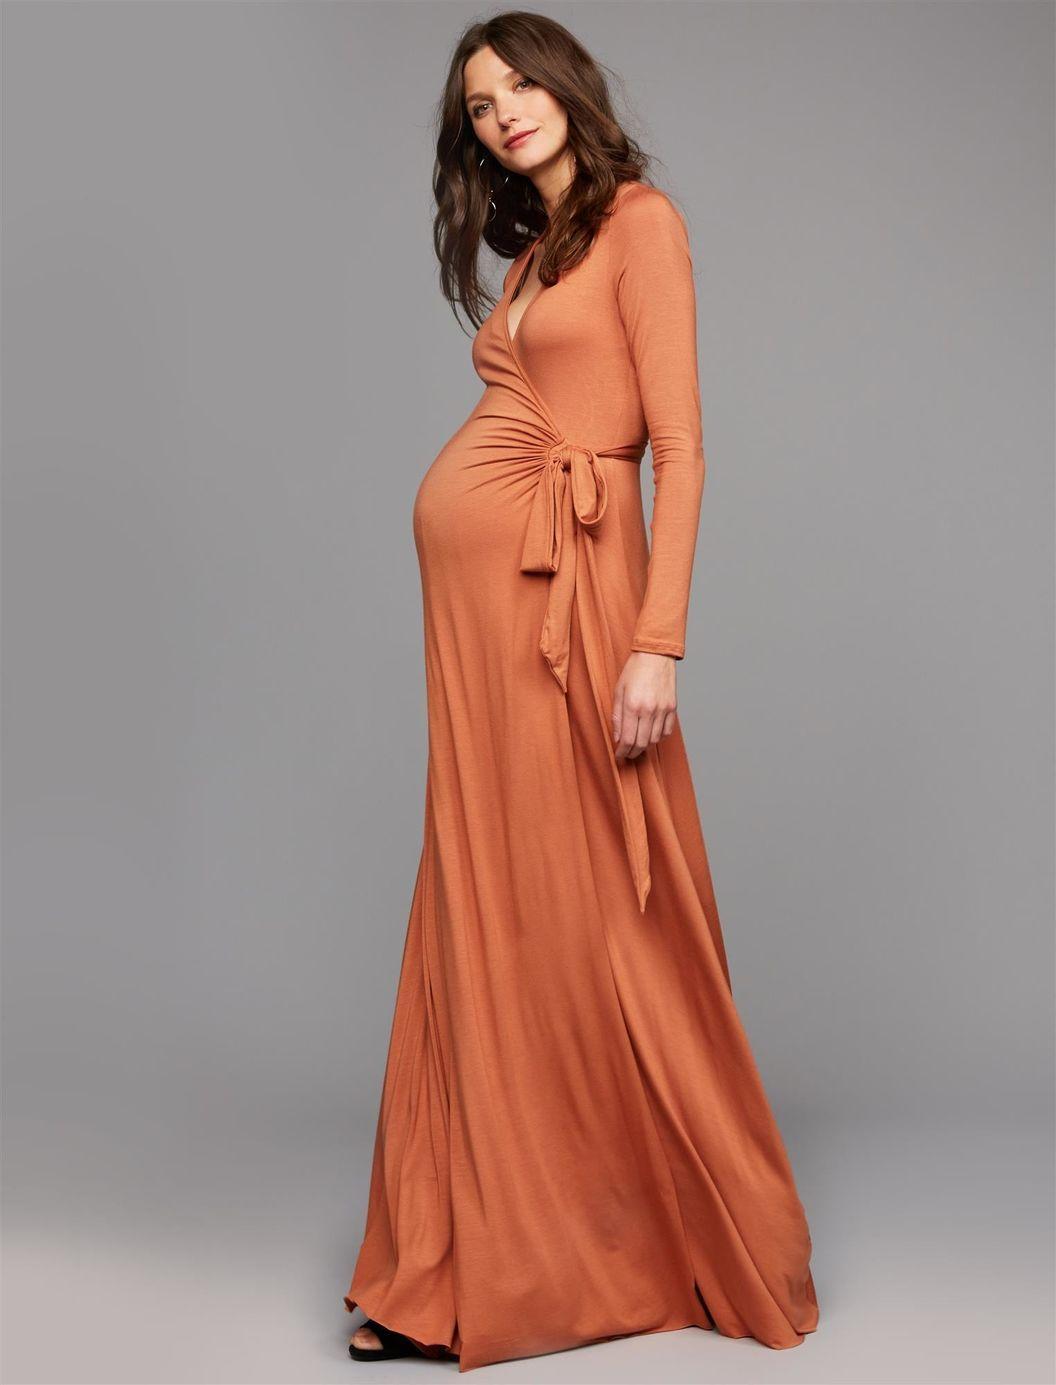 0ec720995d8f6 Baby Shower Dresses, Maxi Wrap Dress, Wrap Dresses, Dress Long, Wedding  Trends